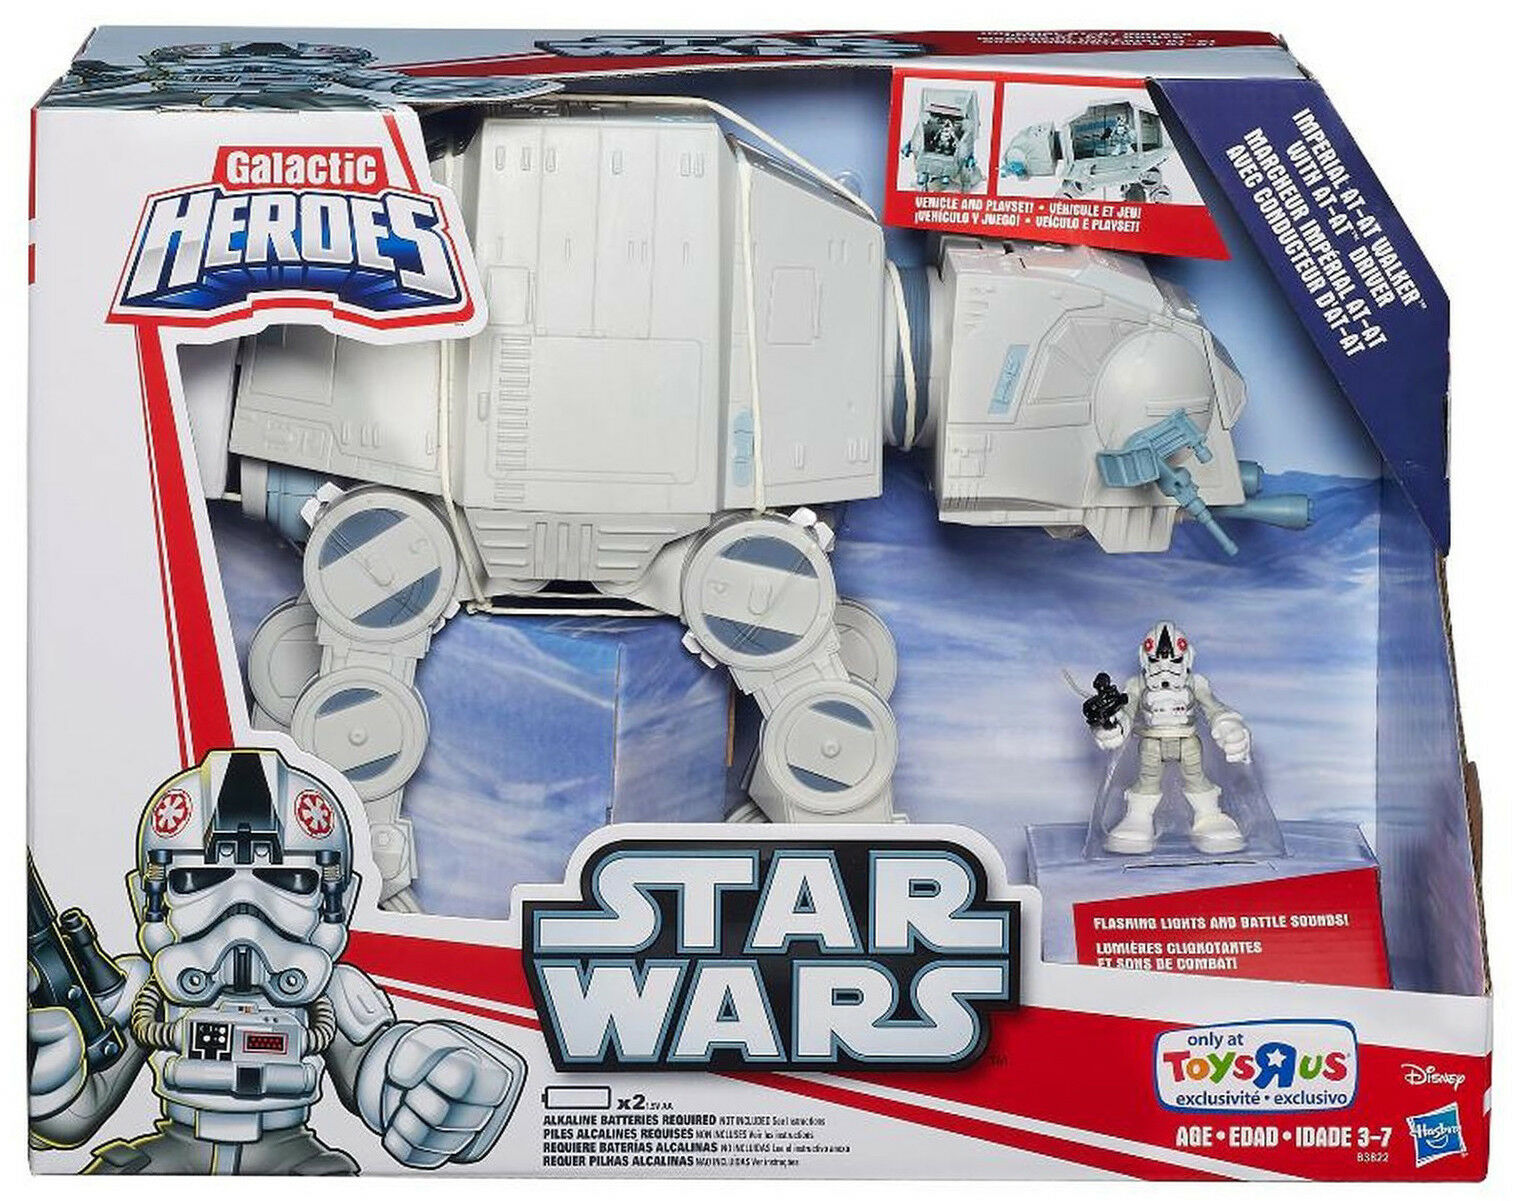 Star Wars Playskool Galactic Heroes Imperial AT-AT Walker Brand New Sealed MISB